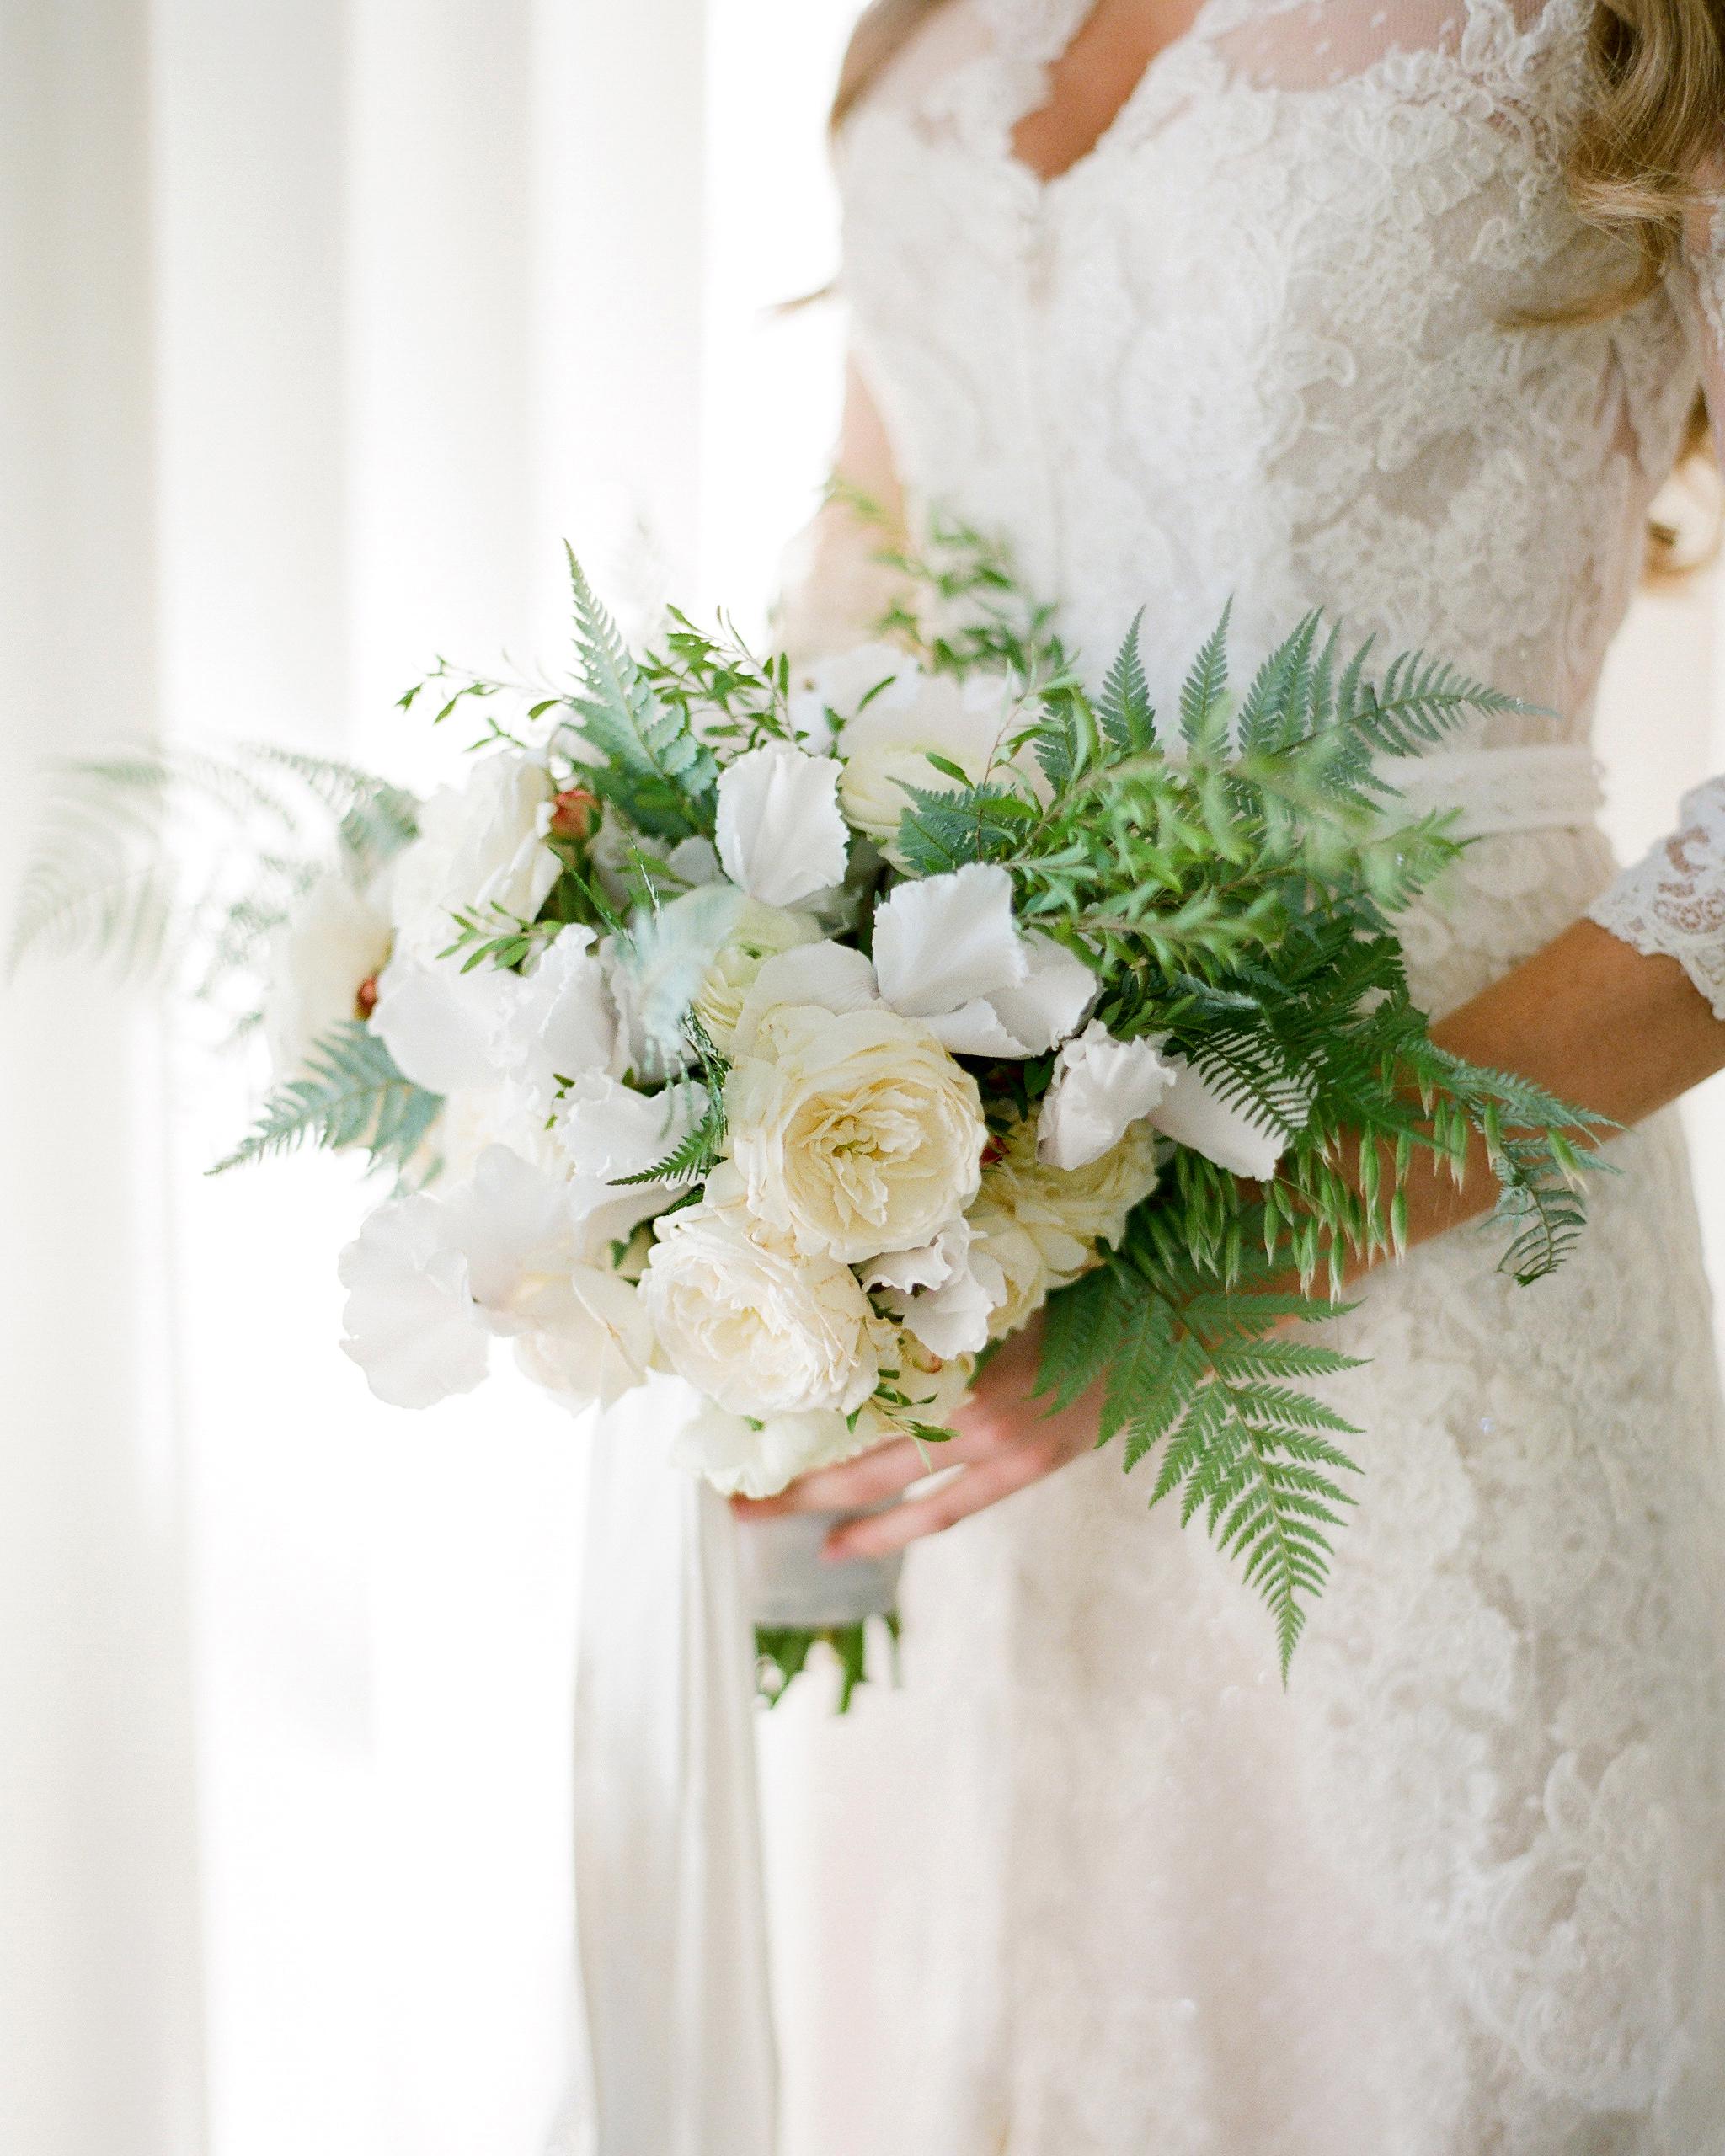 lily-jonathan-wedding-california-66510001-s112482.jpg